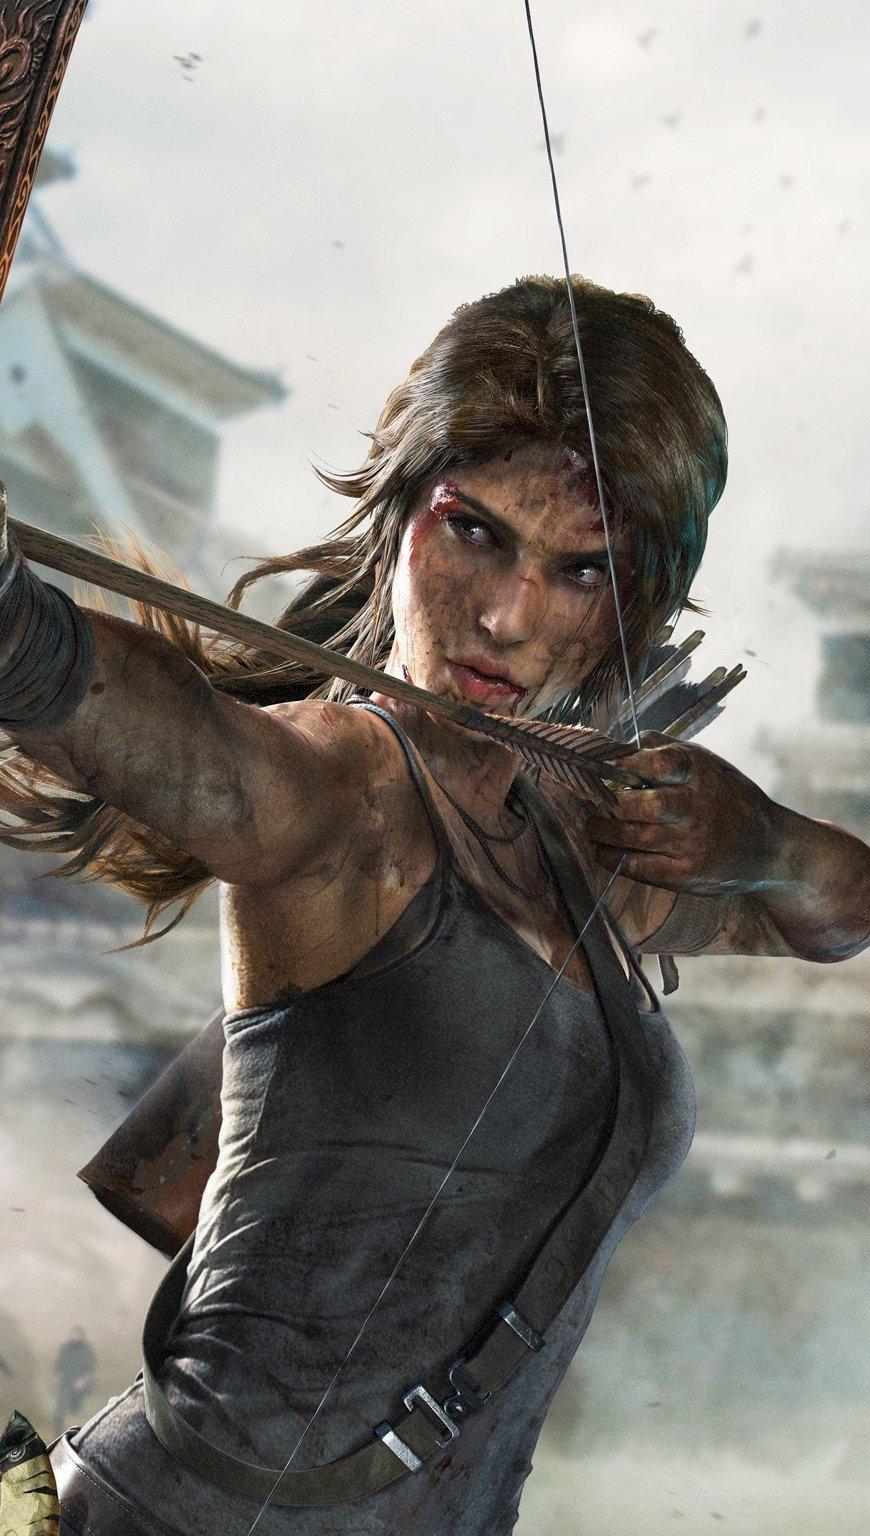 Wallpaper Tomb Raider Definitive Edition Vertical